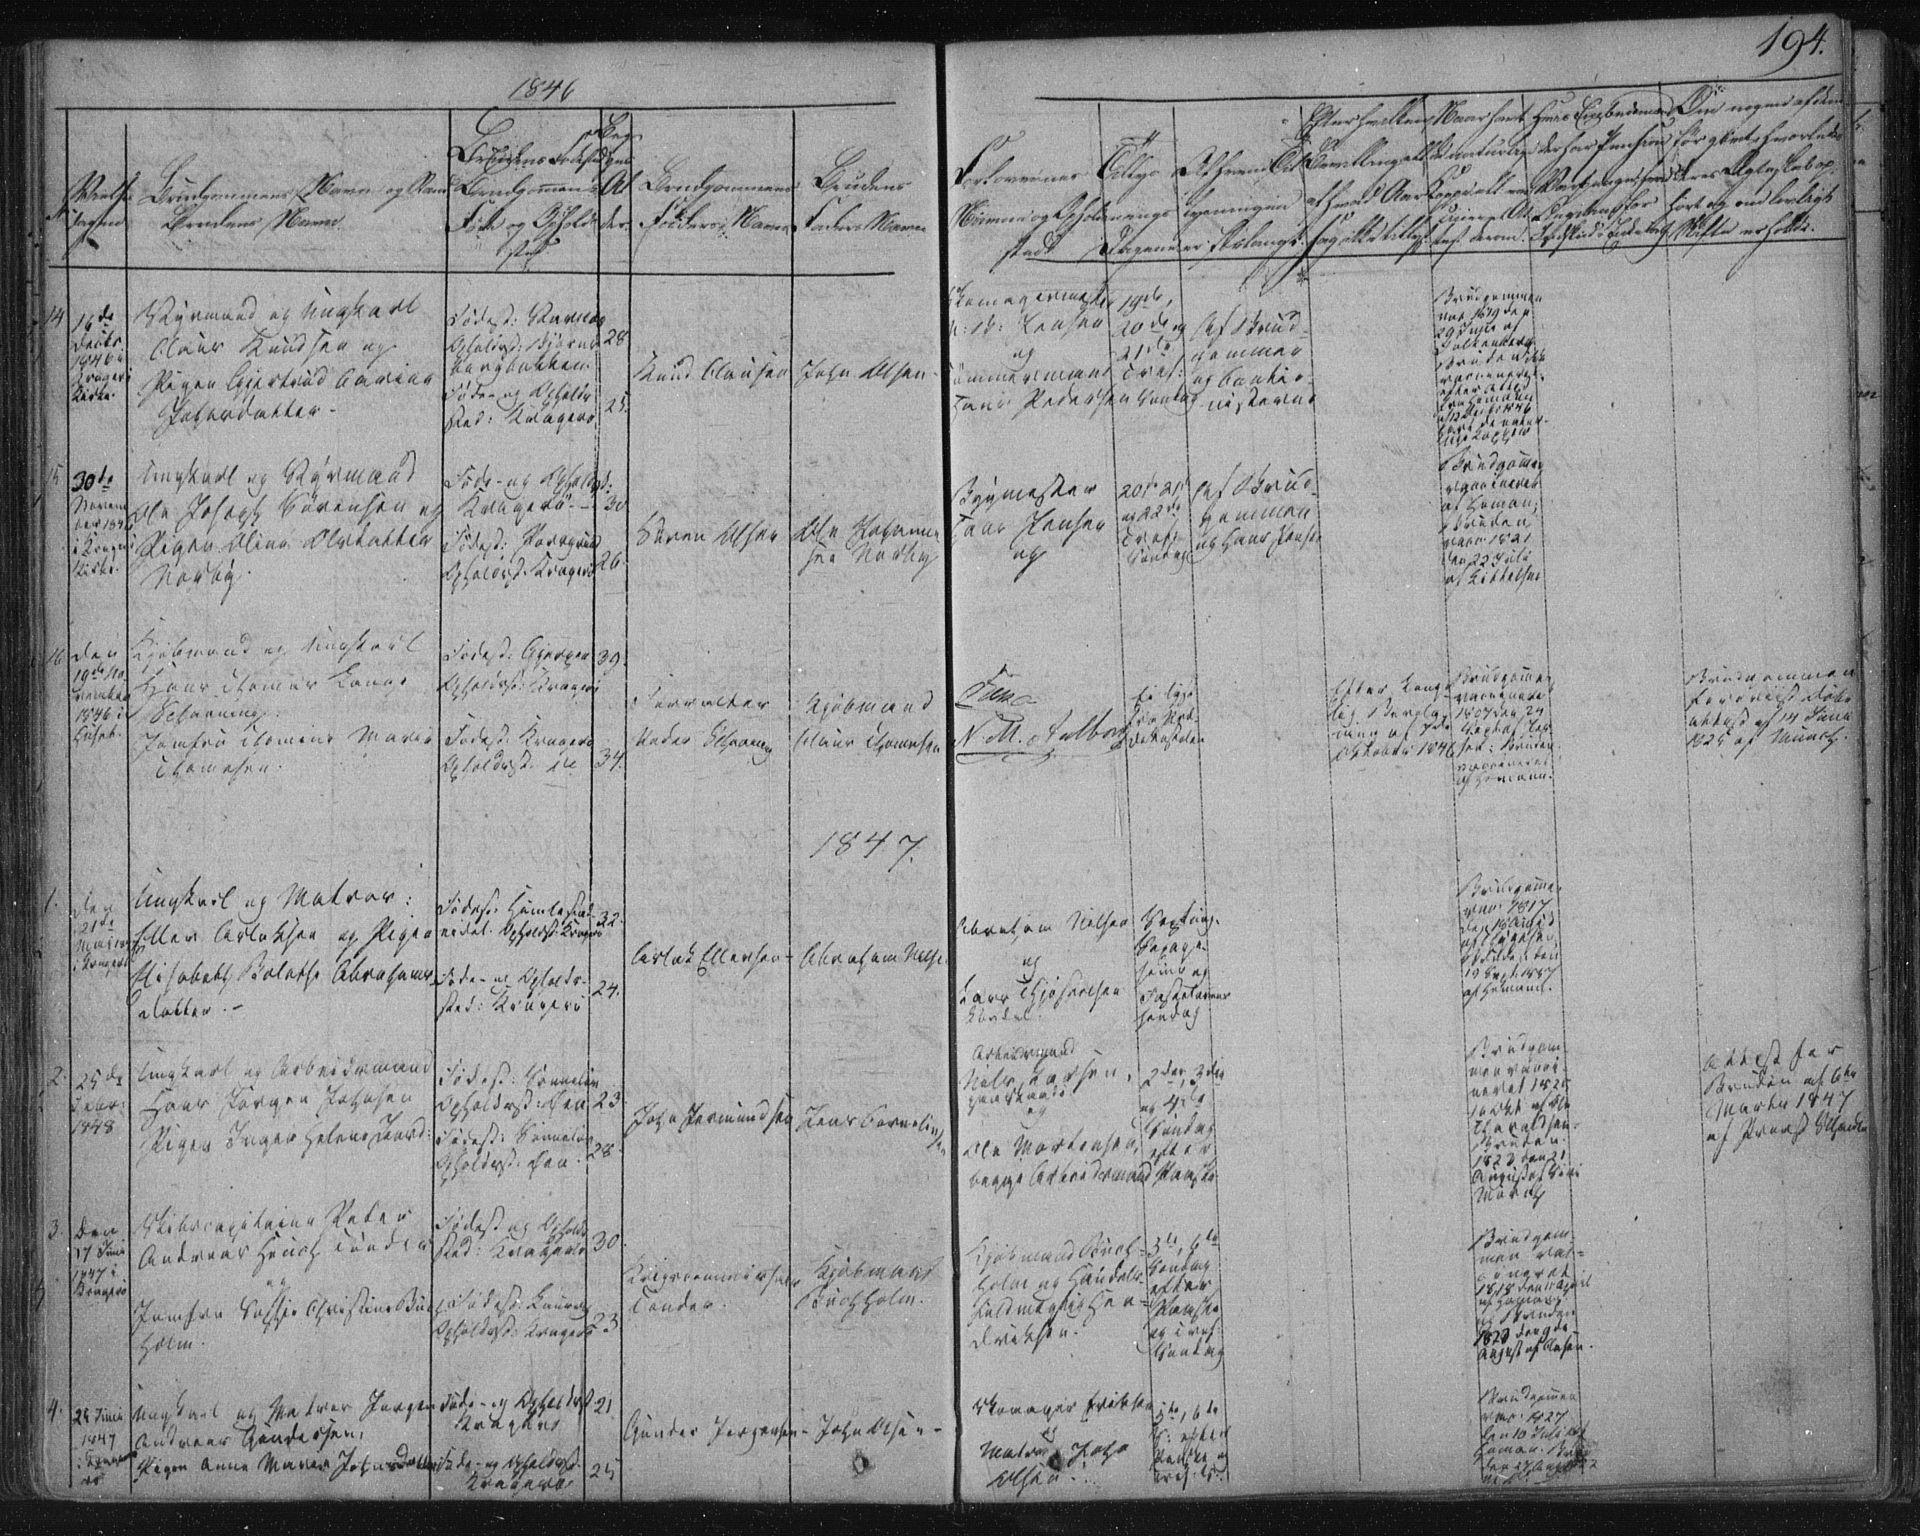 SAKO, Kragerø kirkebøker, F/Fa/L0005: Ministerialbok nr. 5, 1832-1847, s. 194